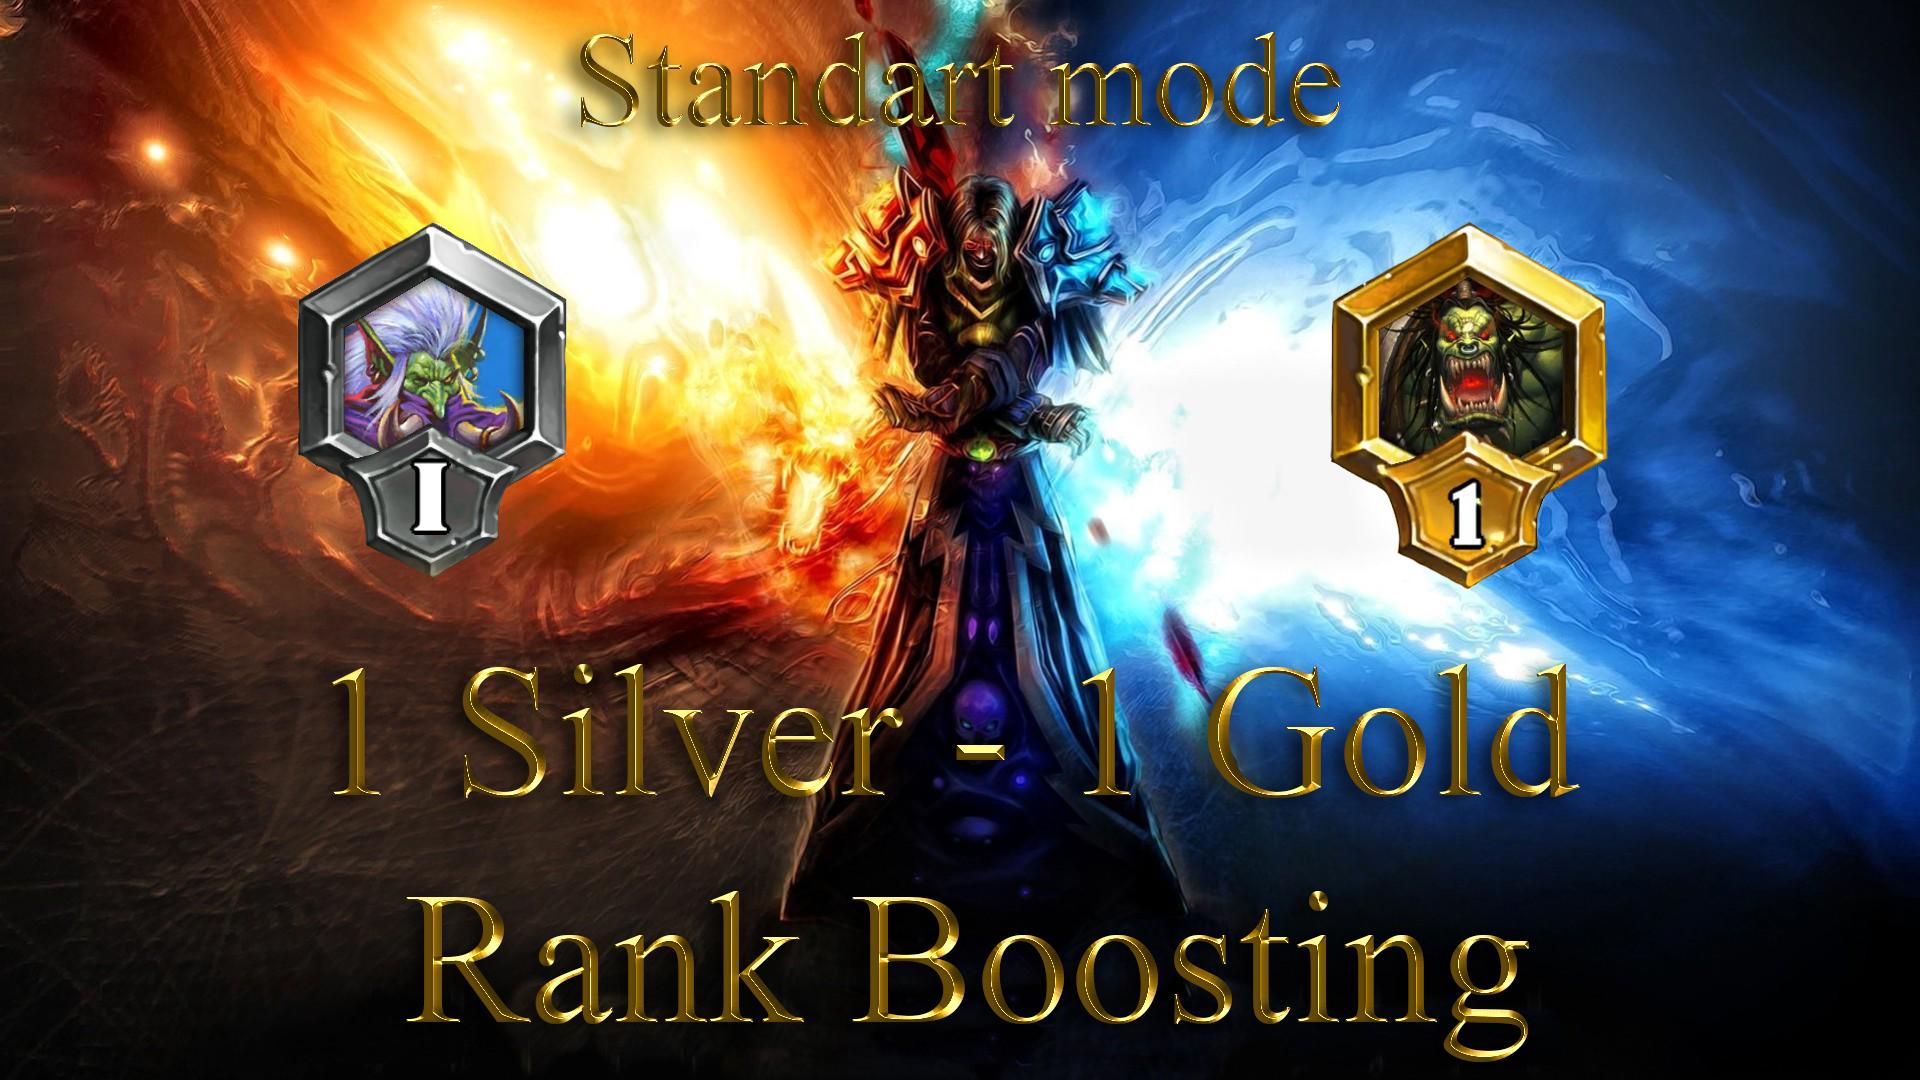 Hearthstone: 1 Rank (Silver) - 1 Rank (Gold) Standart Mode Sedovlasiy - e2p.com